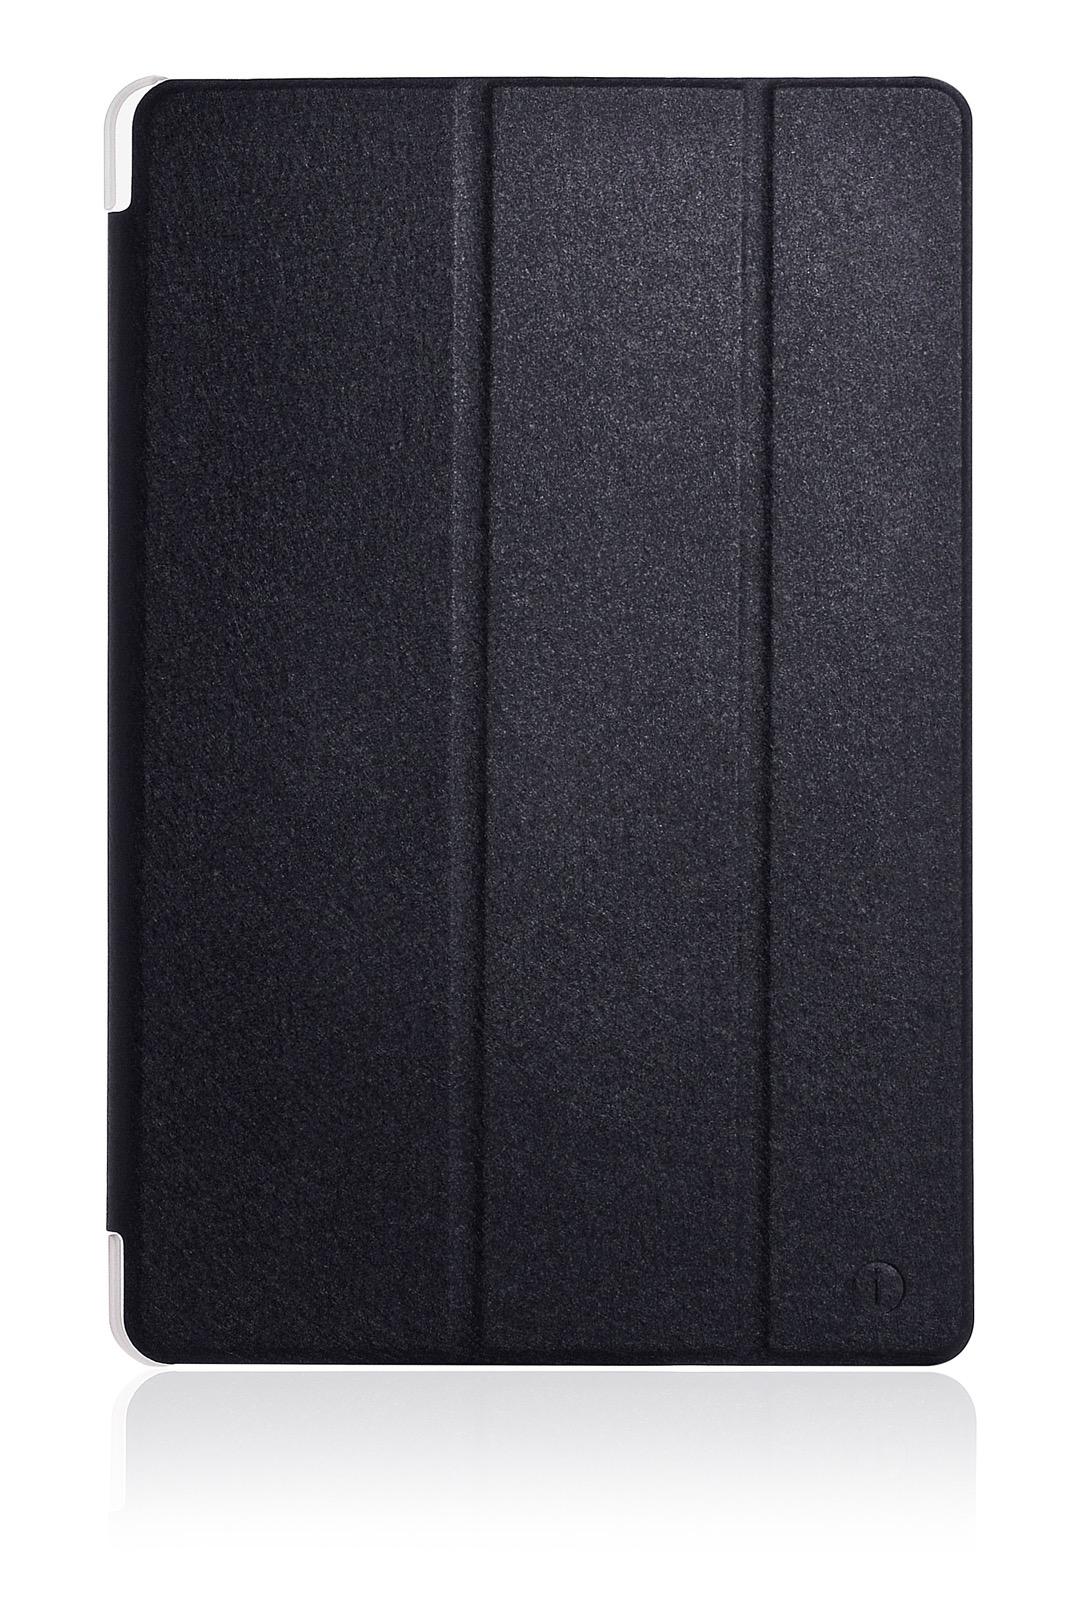 Чехол для планшета iNeez книжка Samsung Galaxy Tab S4 T-830/835 10.5, черный